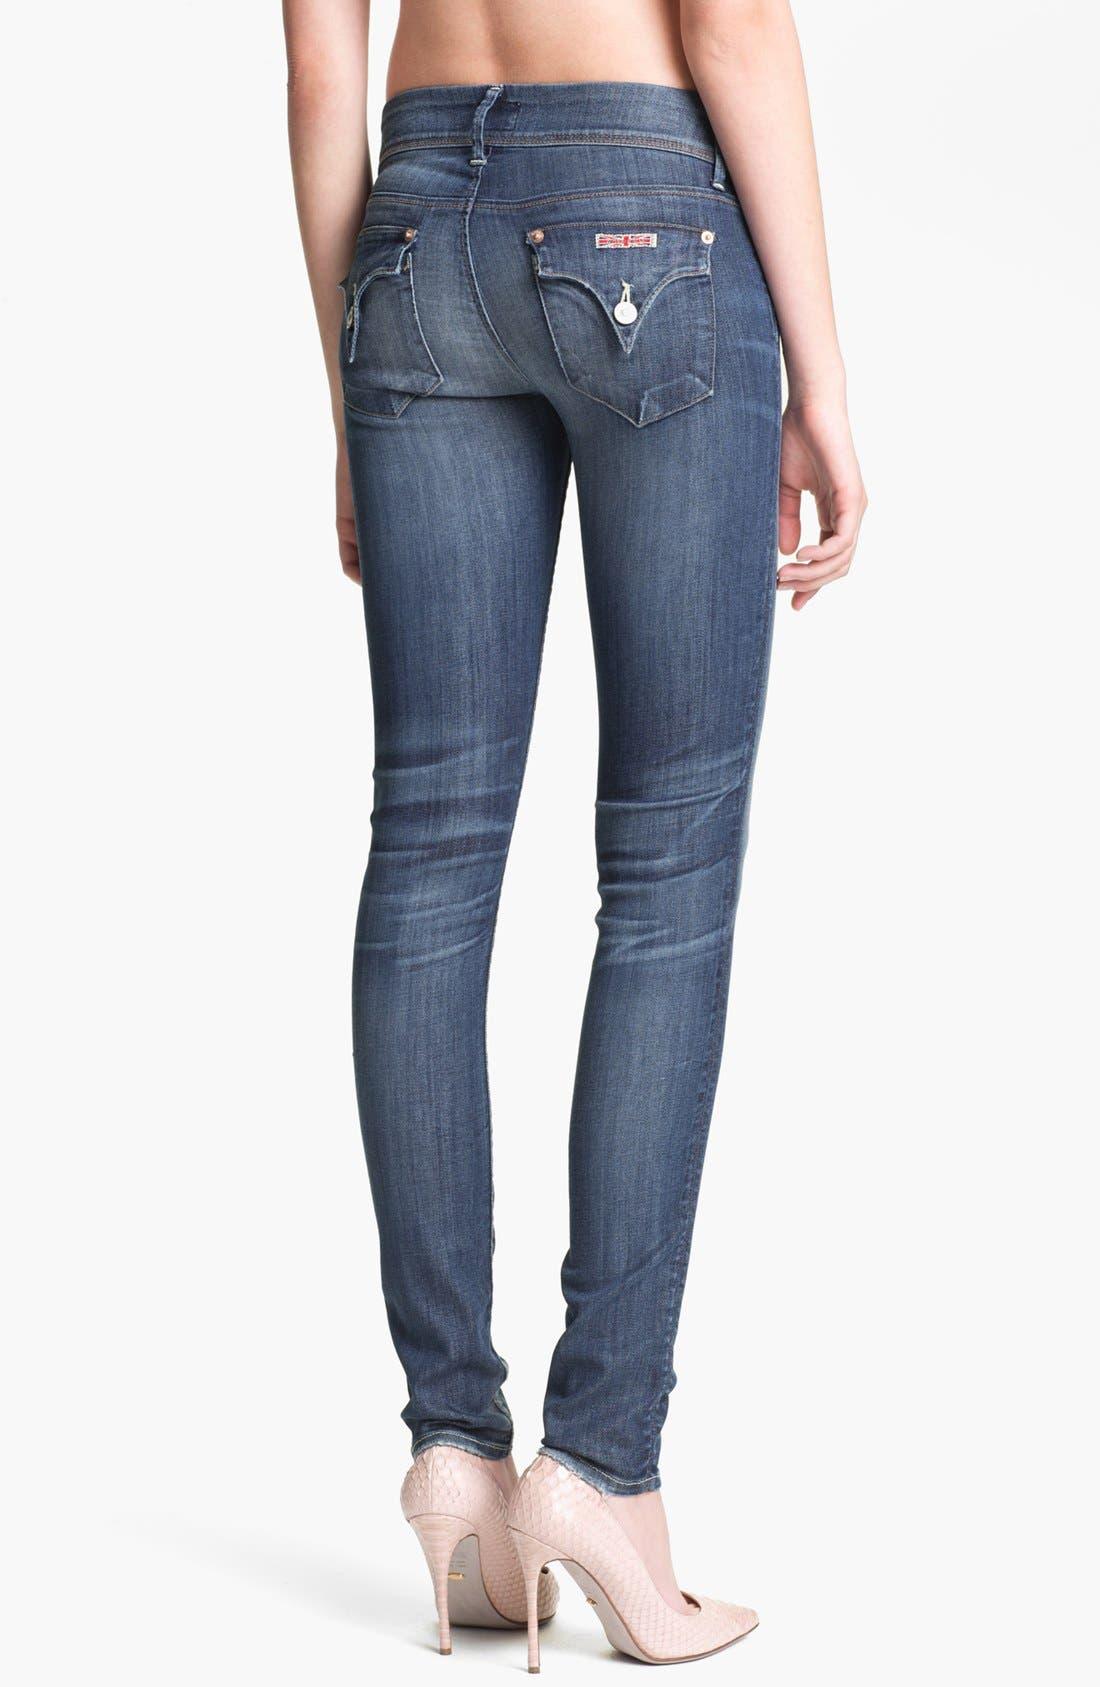 Alternate Image 2  - Hudson Jeans 'Collin' Distressed Skinny Stretch Jeans (Youth Vintage)